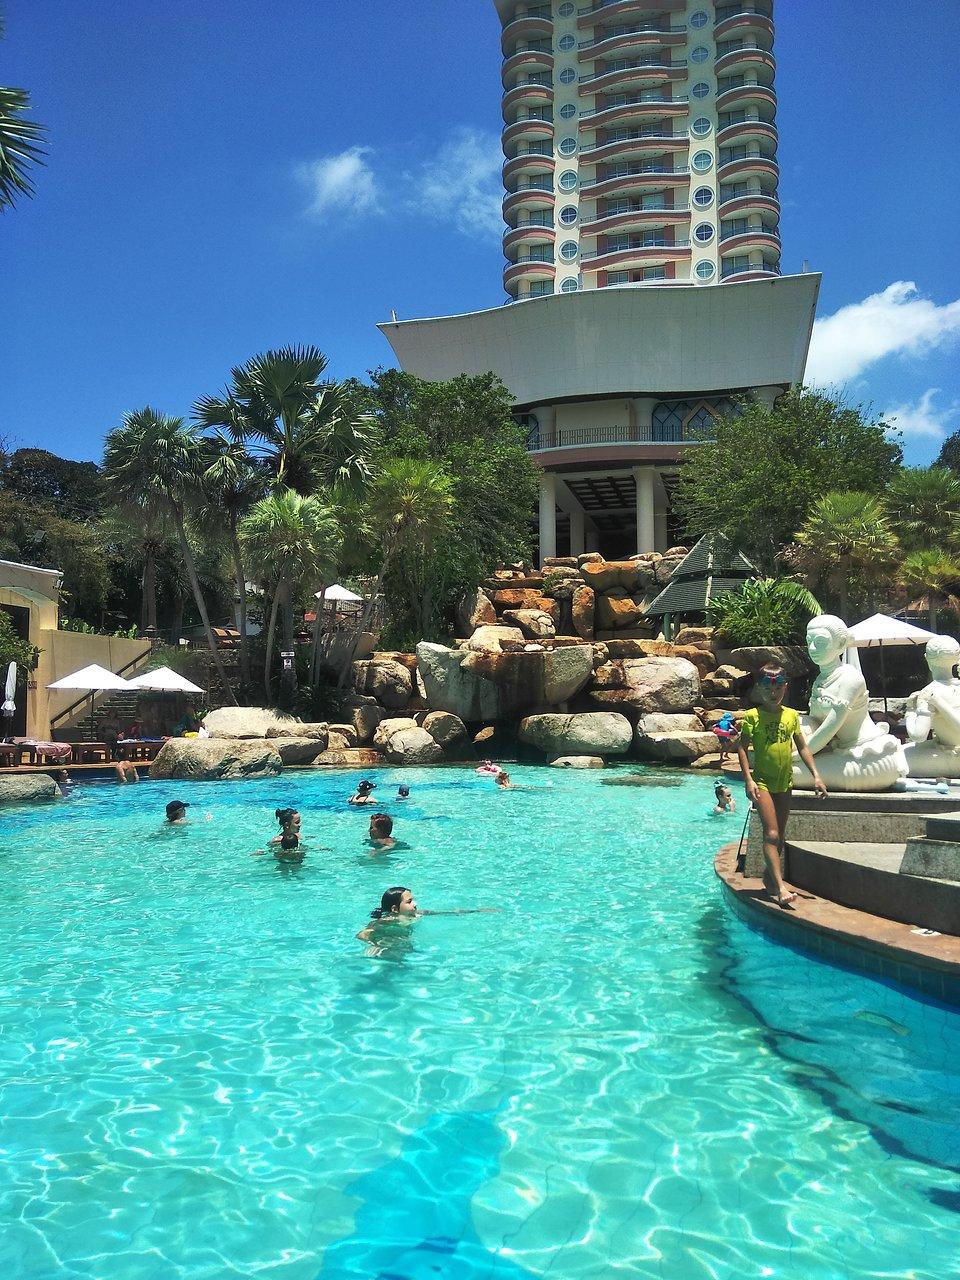 Long Beach Garden Hotel Spa 68 8 Updated 2018 Prices Reviews Pattaya Thailand Tripadvisor